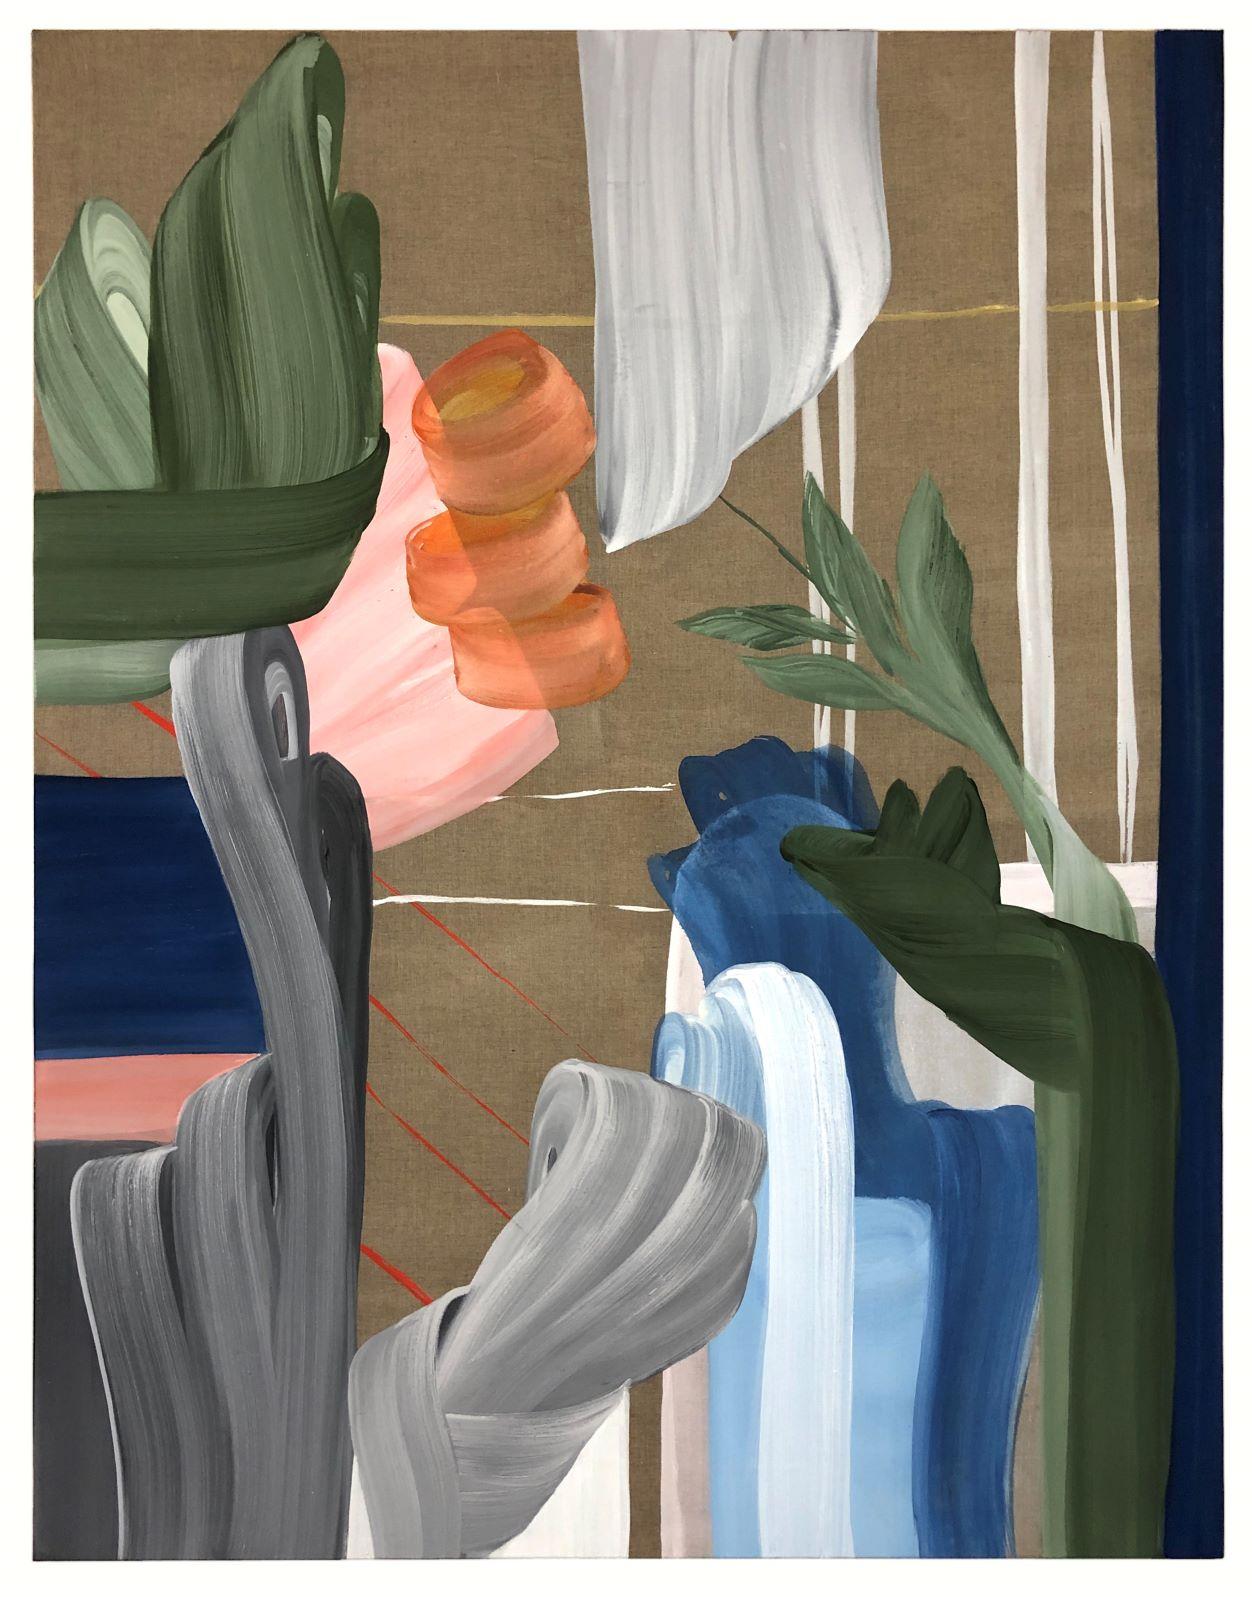 Mojé Assefjah, Golden Line, 2021, Eitempera auf Leinen, 180 x 140 cm, Courtesy: Mojé Assefjah und Galerie Tanit